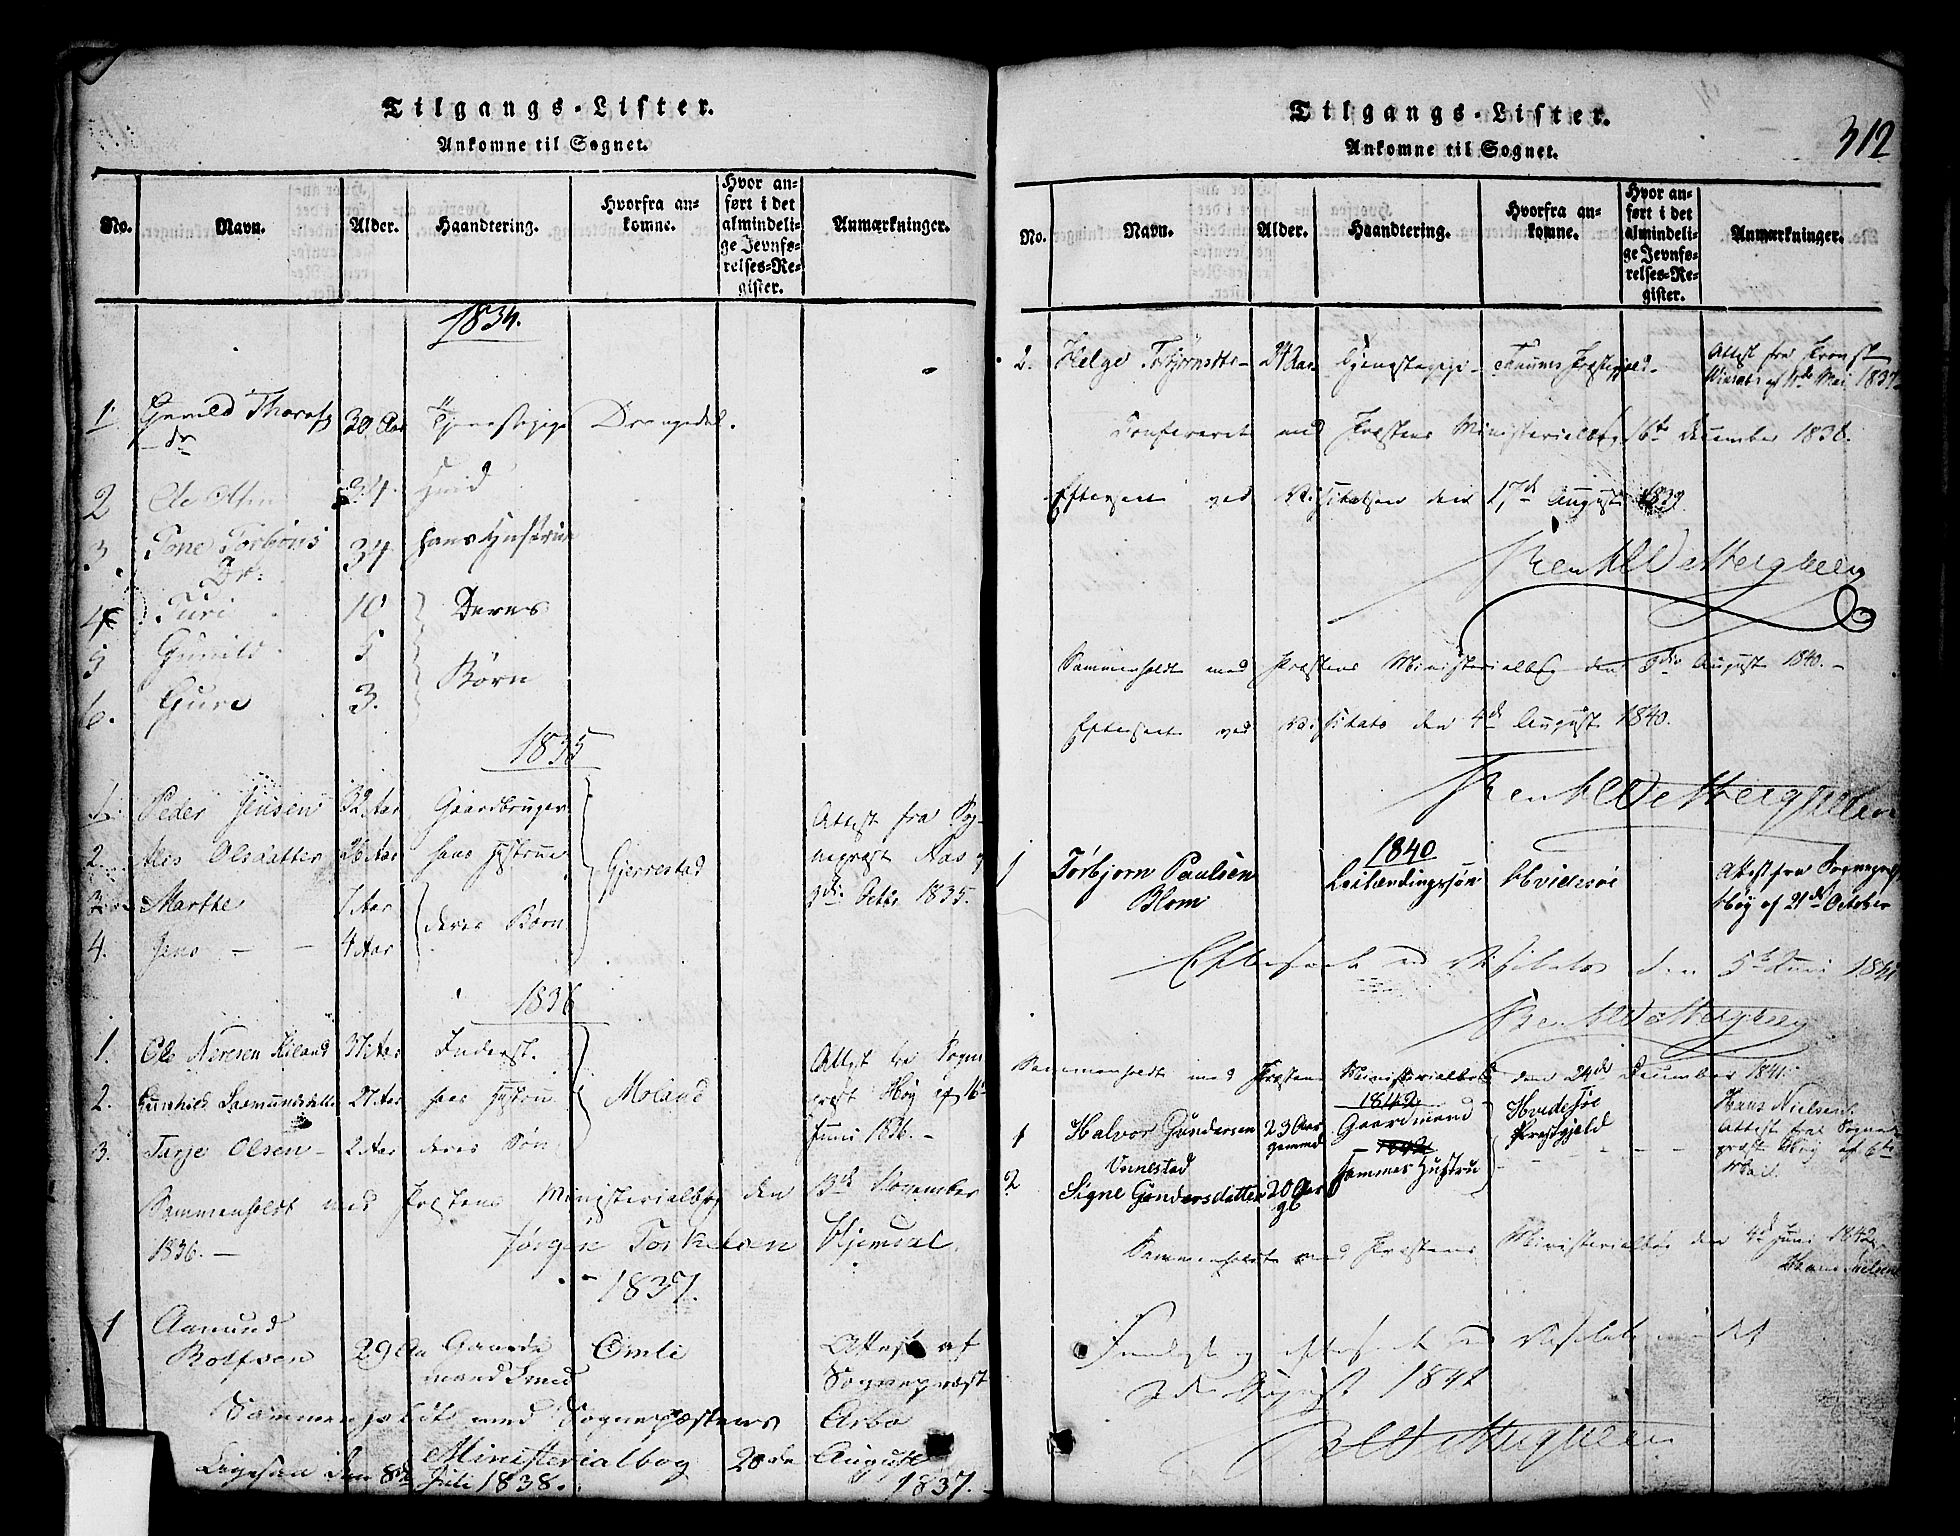 SAKO, Nissedal kirkebøker, G/Gb/L0001: Klokkerbok nr. II 1, 1814-1862, s. 312